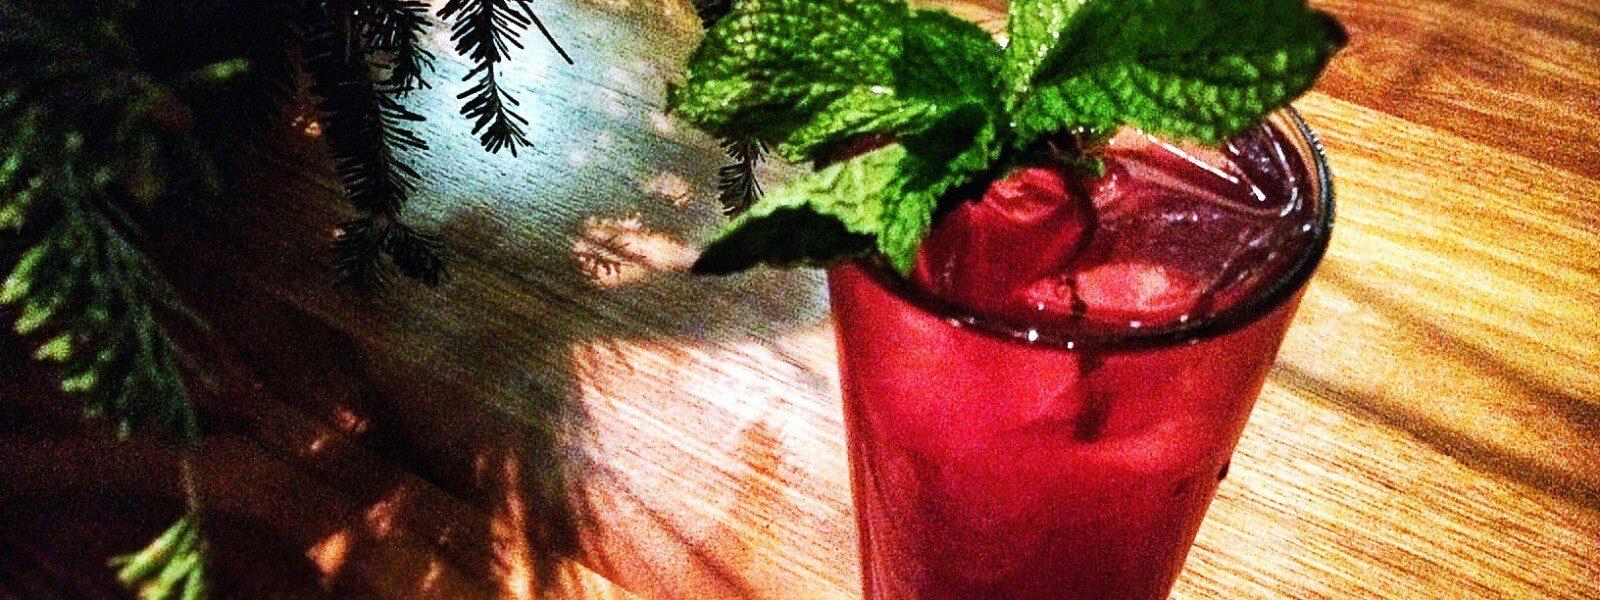 Santa Rose cocktail garnished with mint.